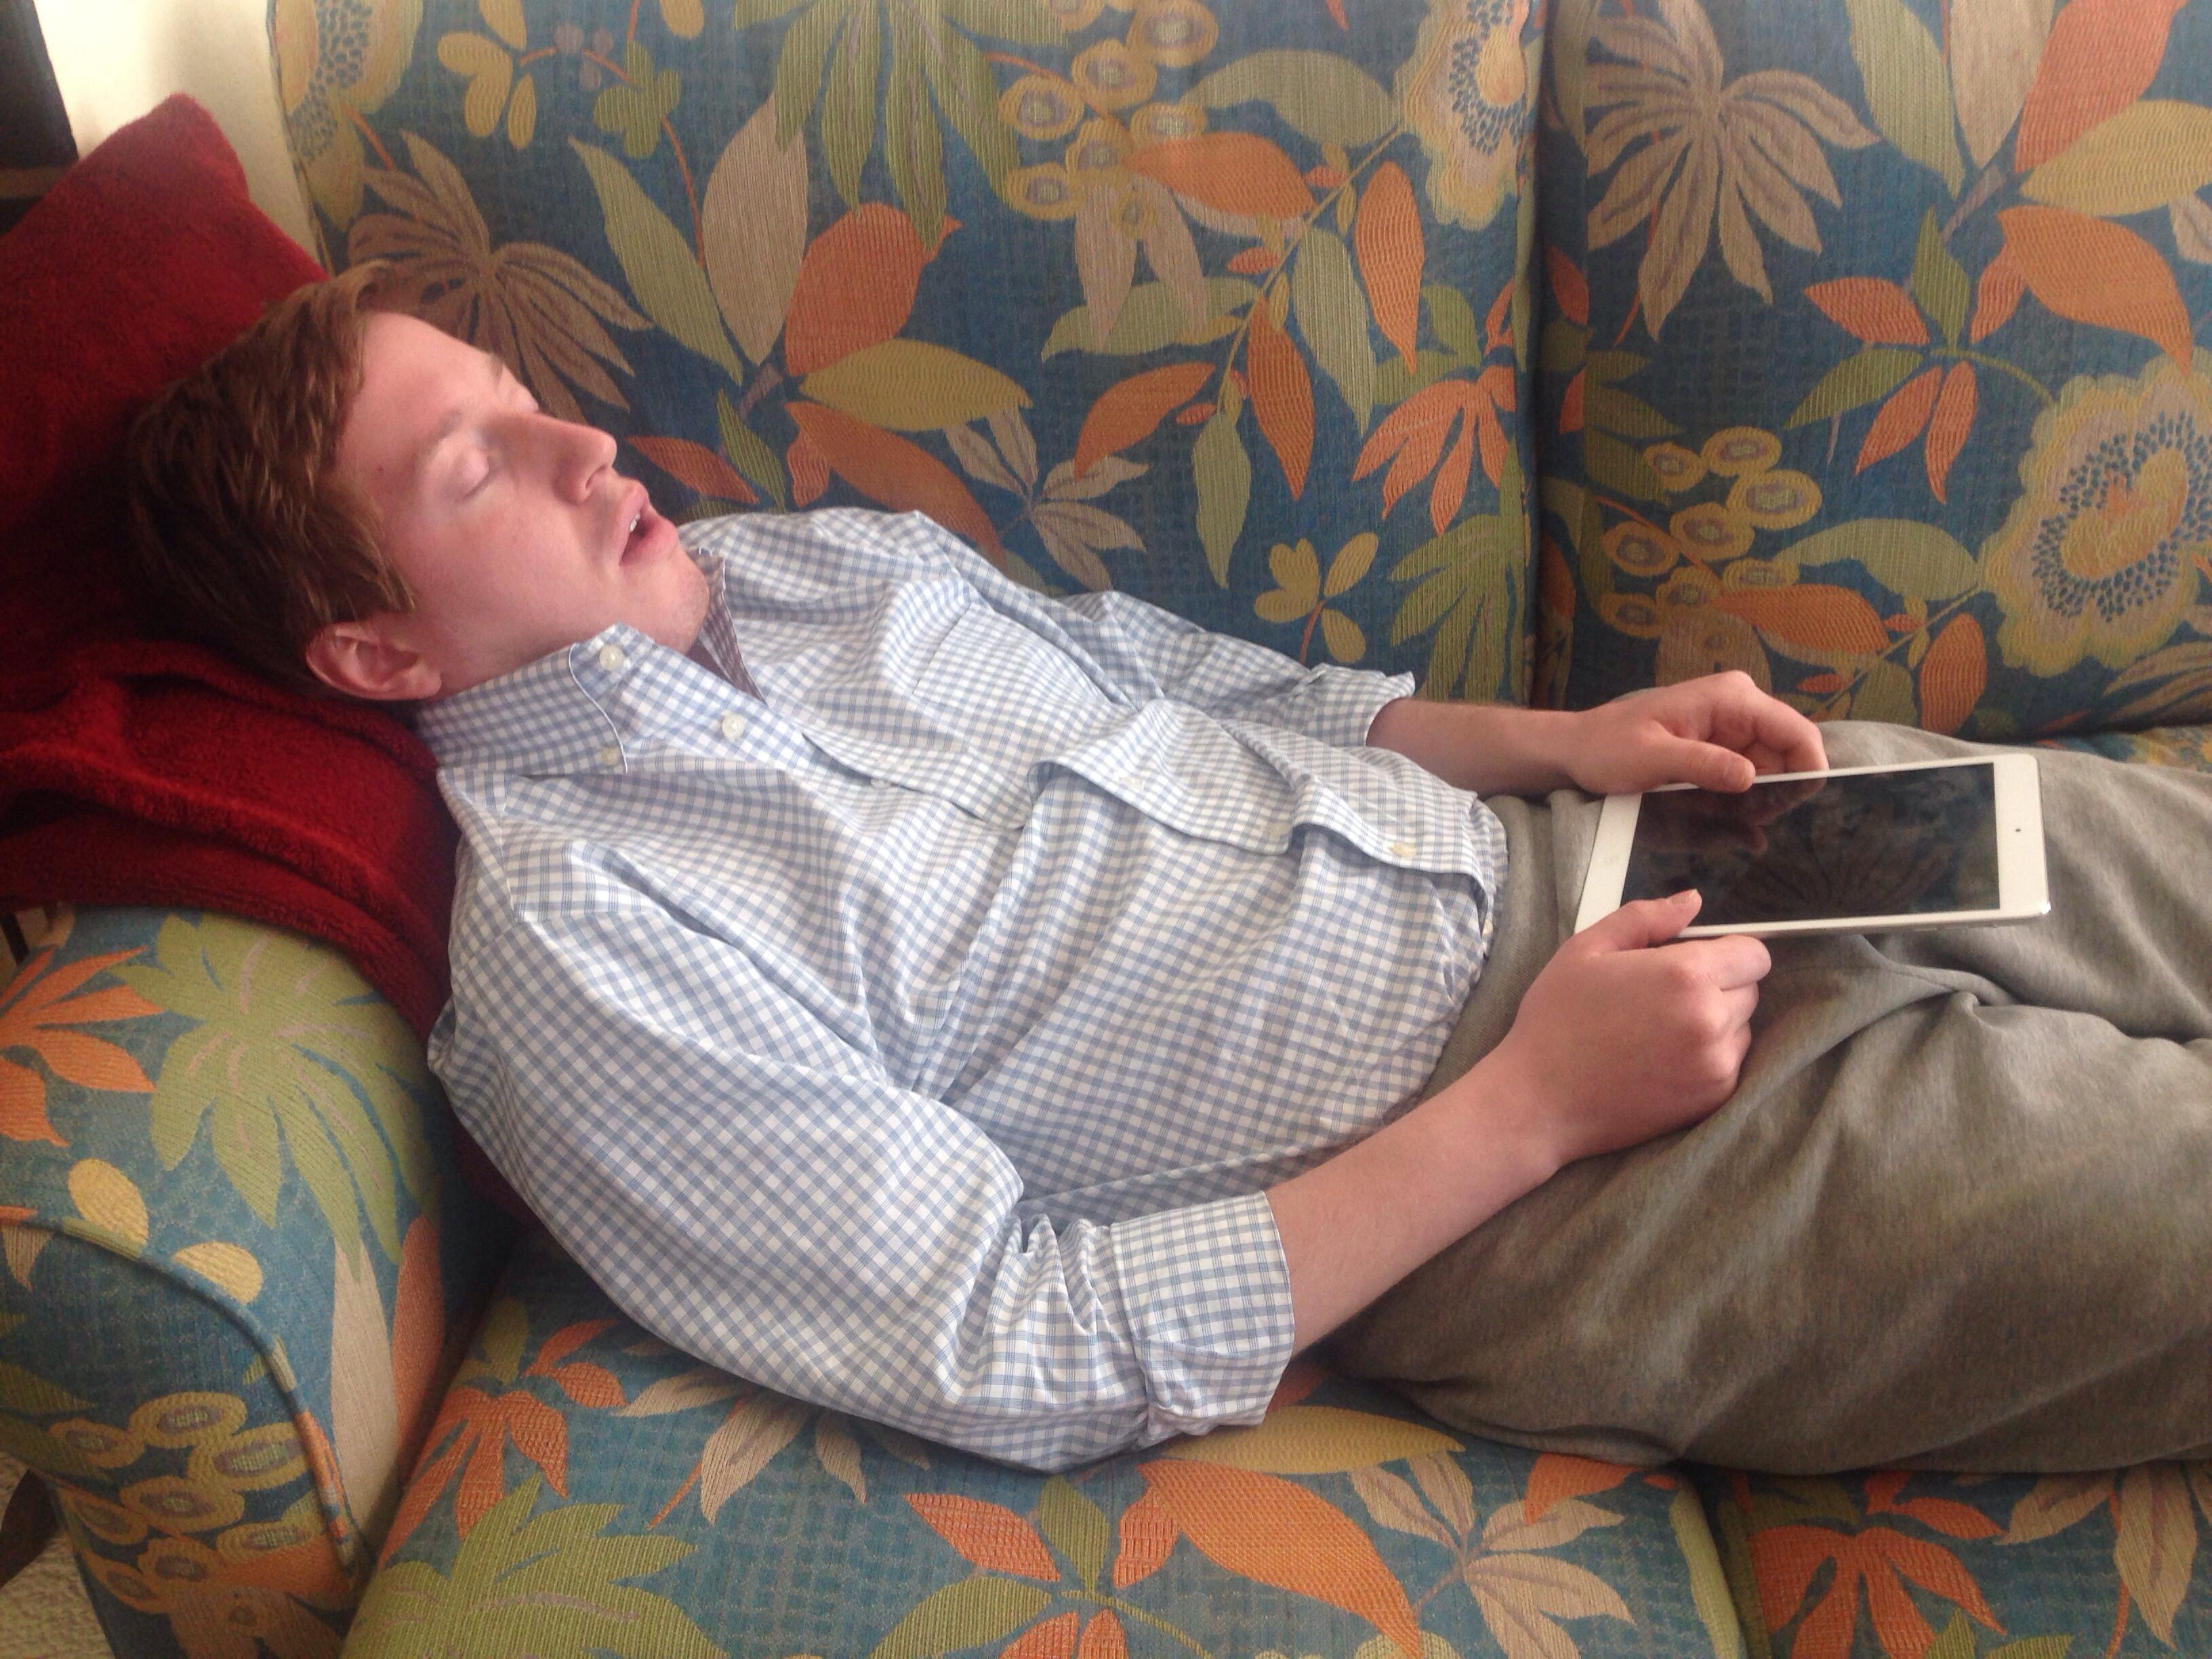 Sleeping position of man